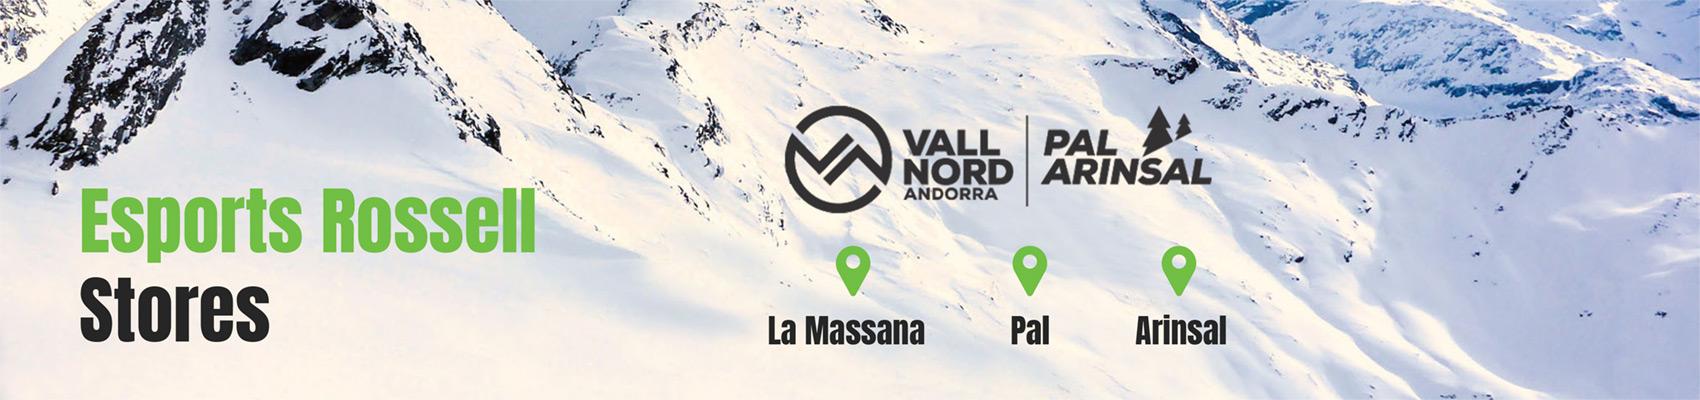 esports rossell stores rental ski vallnord andorra